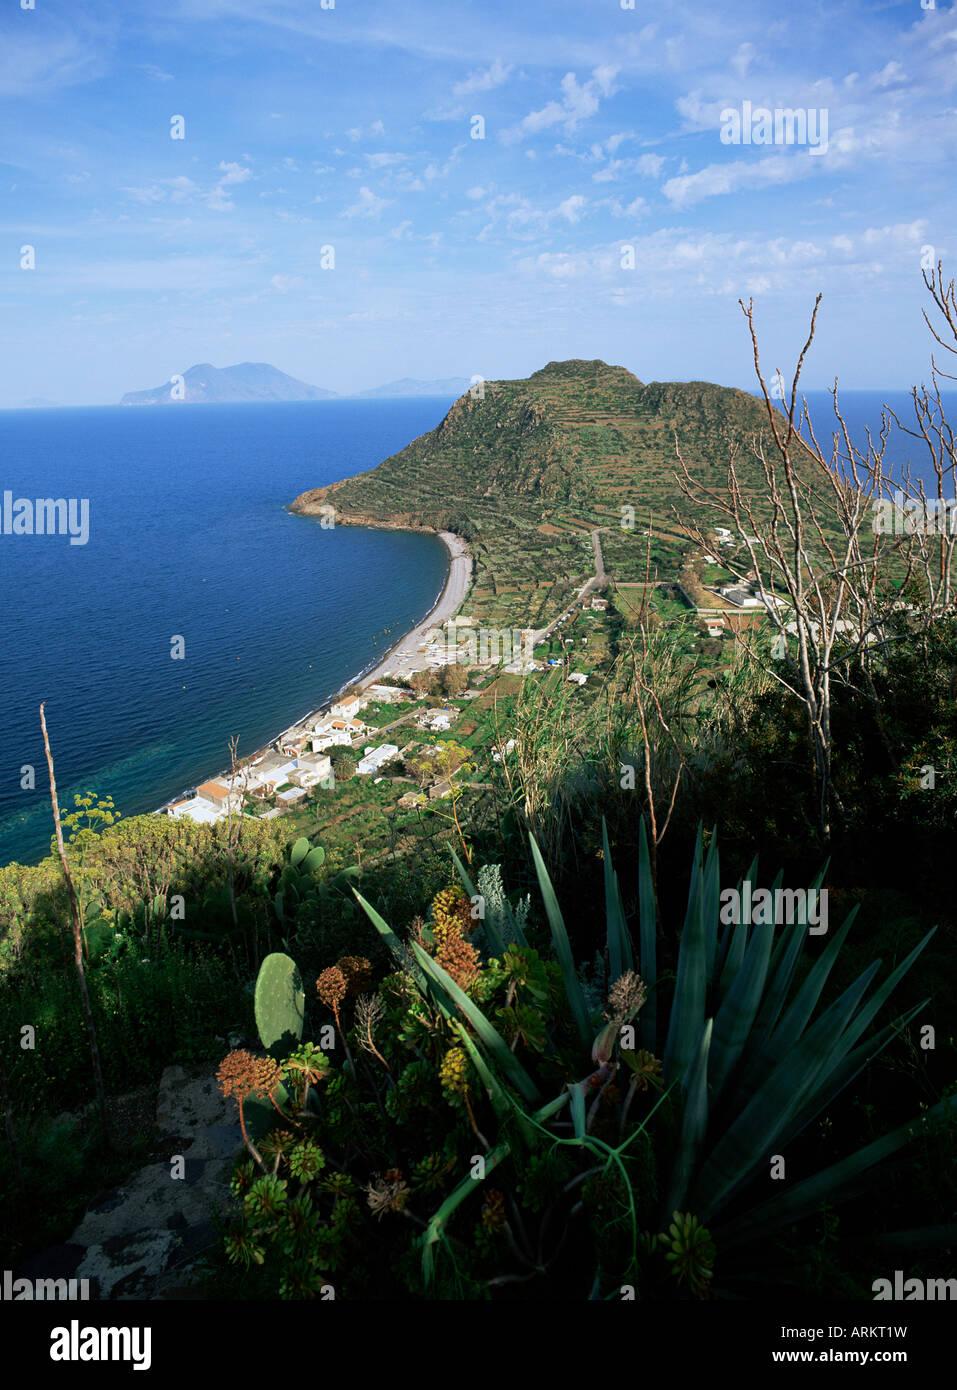 Island of Filicudi, Aeolian Islands (Eolian Islands) (Lipari Islands), UNESCO World Heritage Site, Italy, Europe Stock Photo